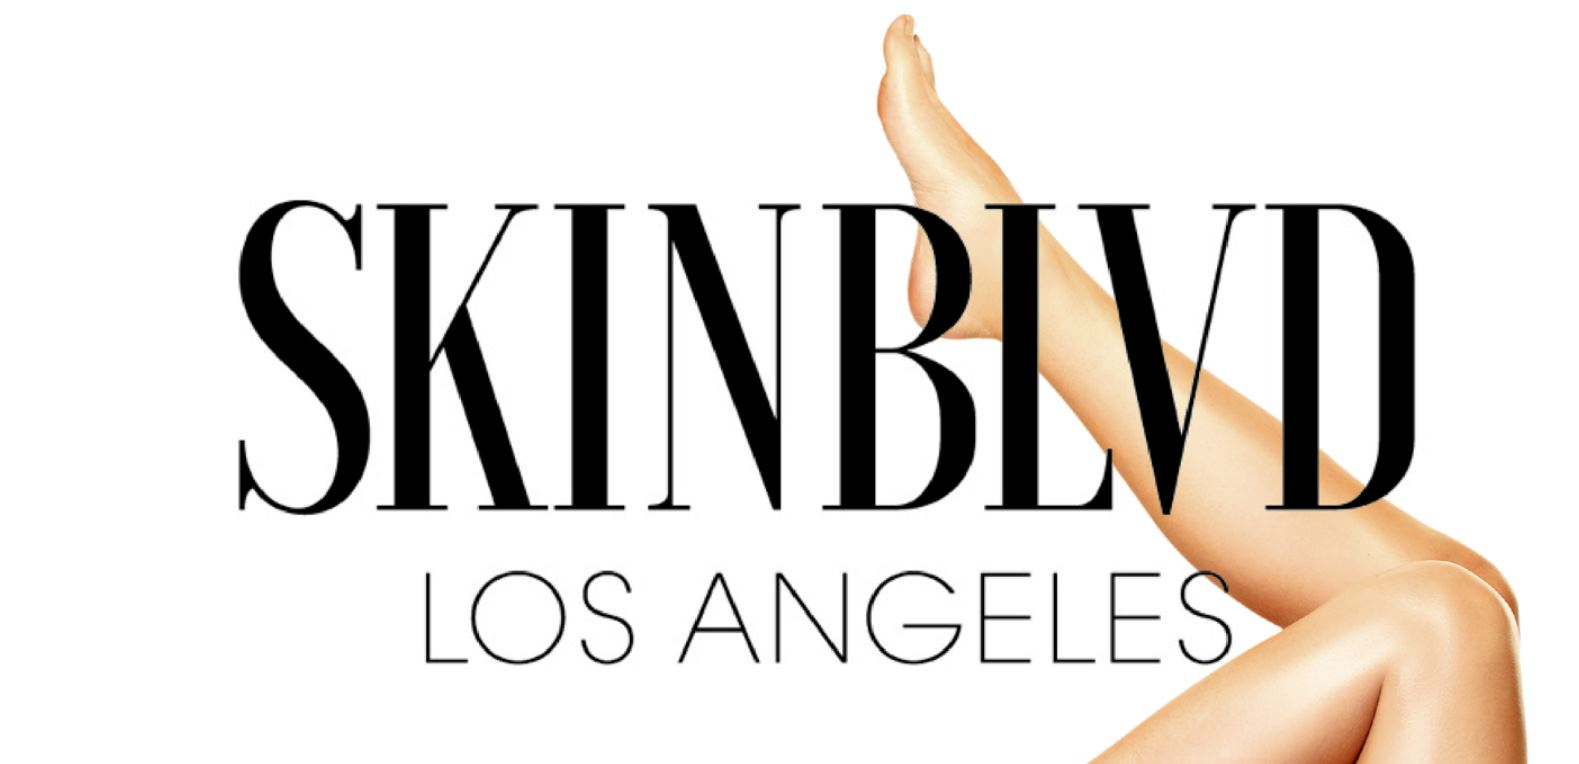 Skin Blvd LA